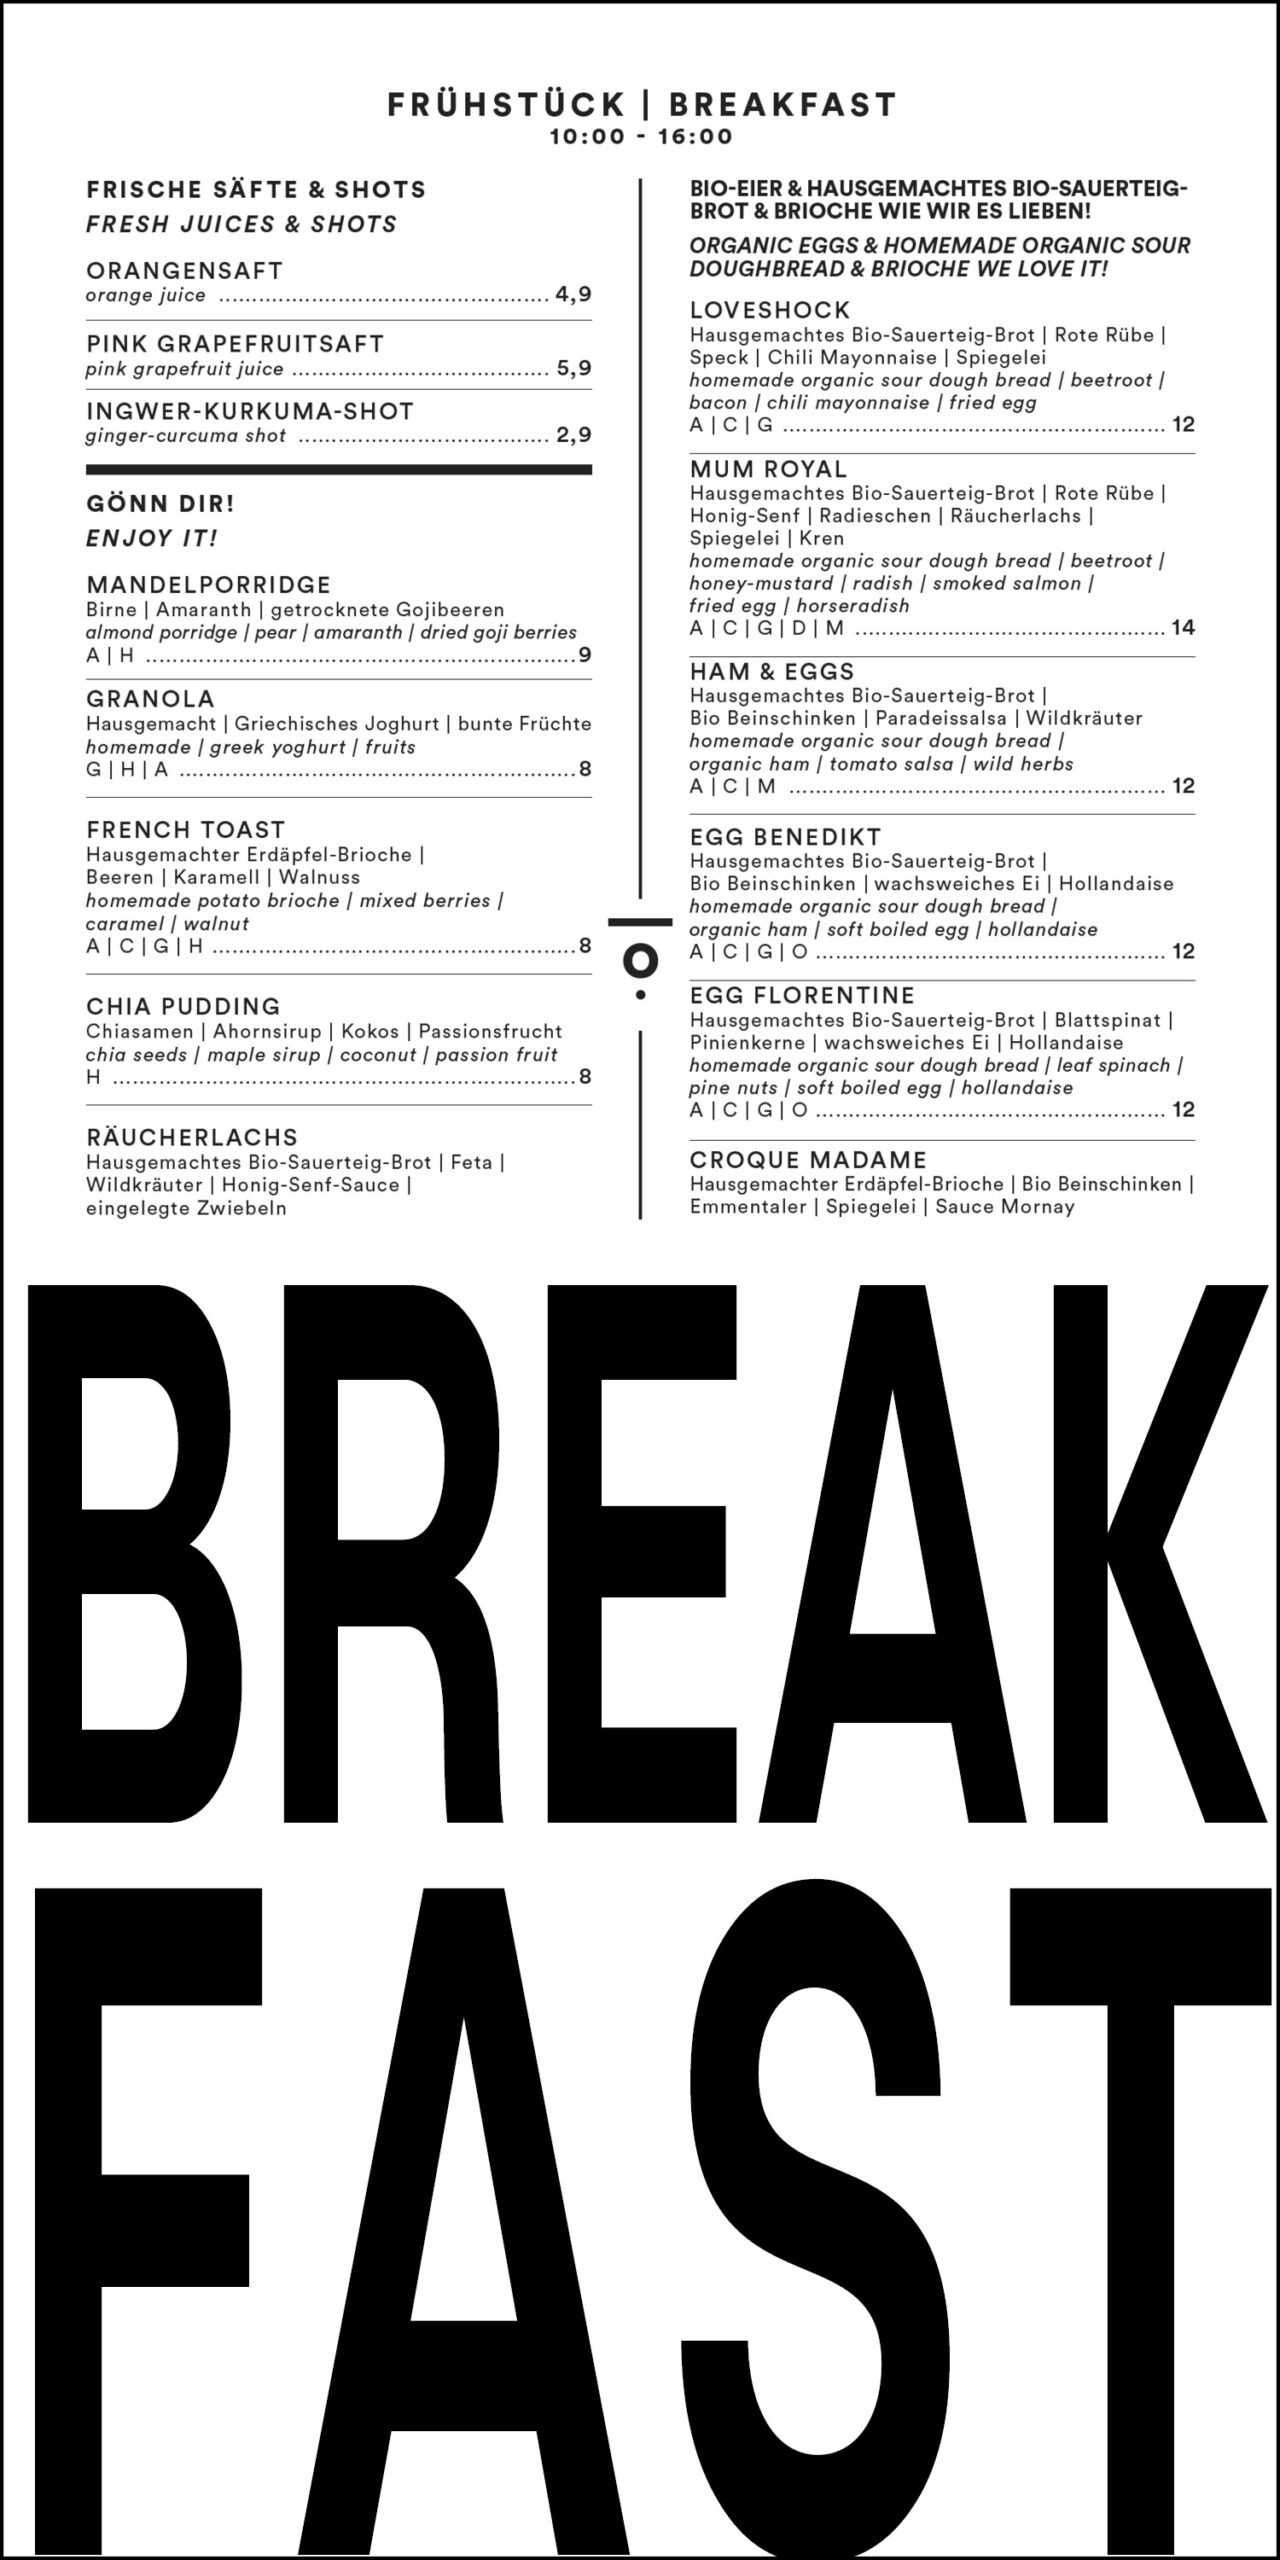 salonplafond-wien-speisekarte-fruehstueck-breakfast-menu-vienna-1010